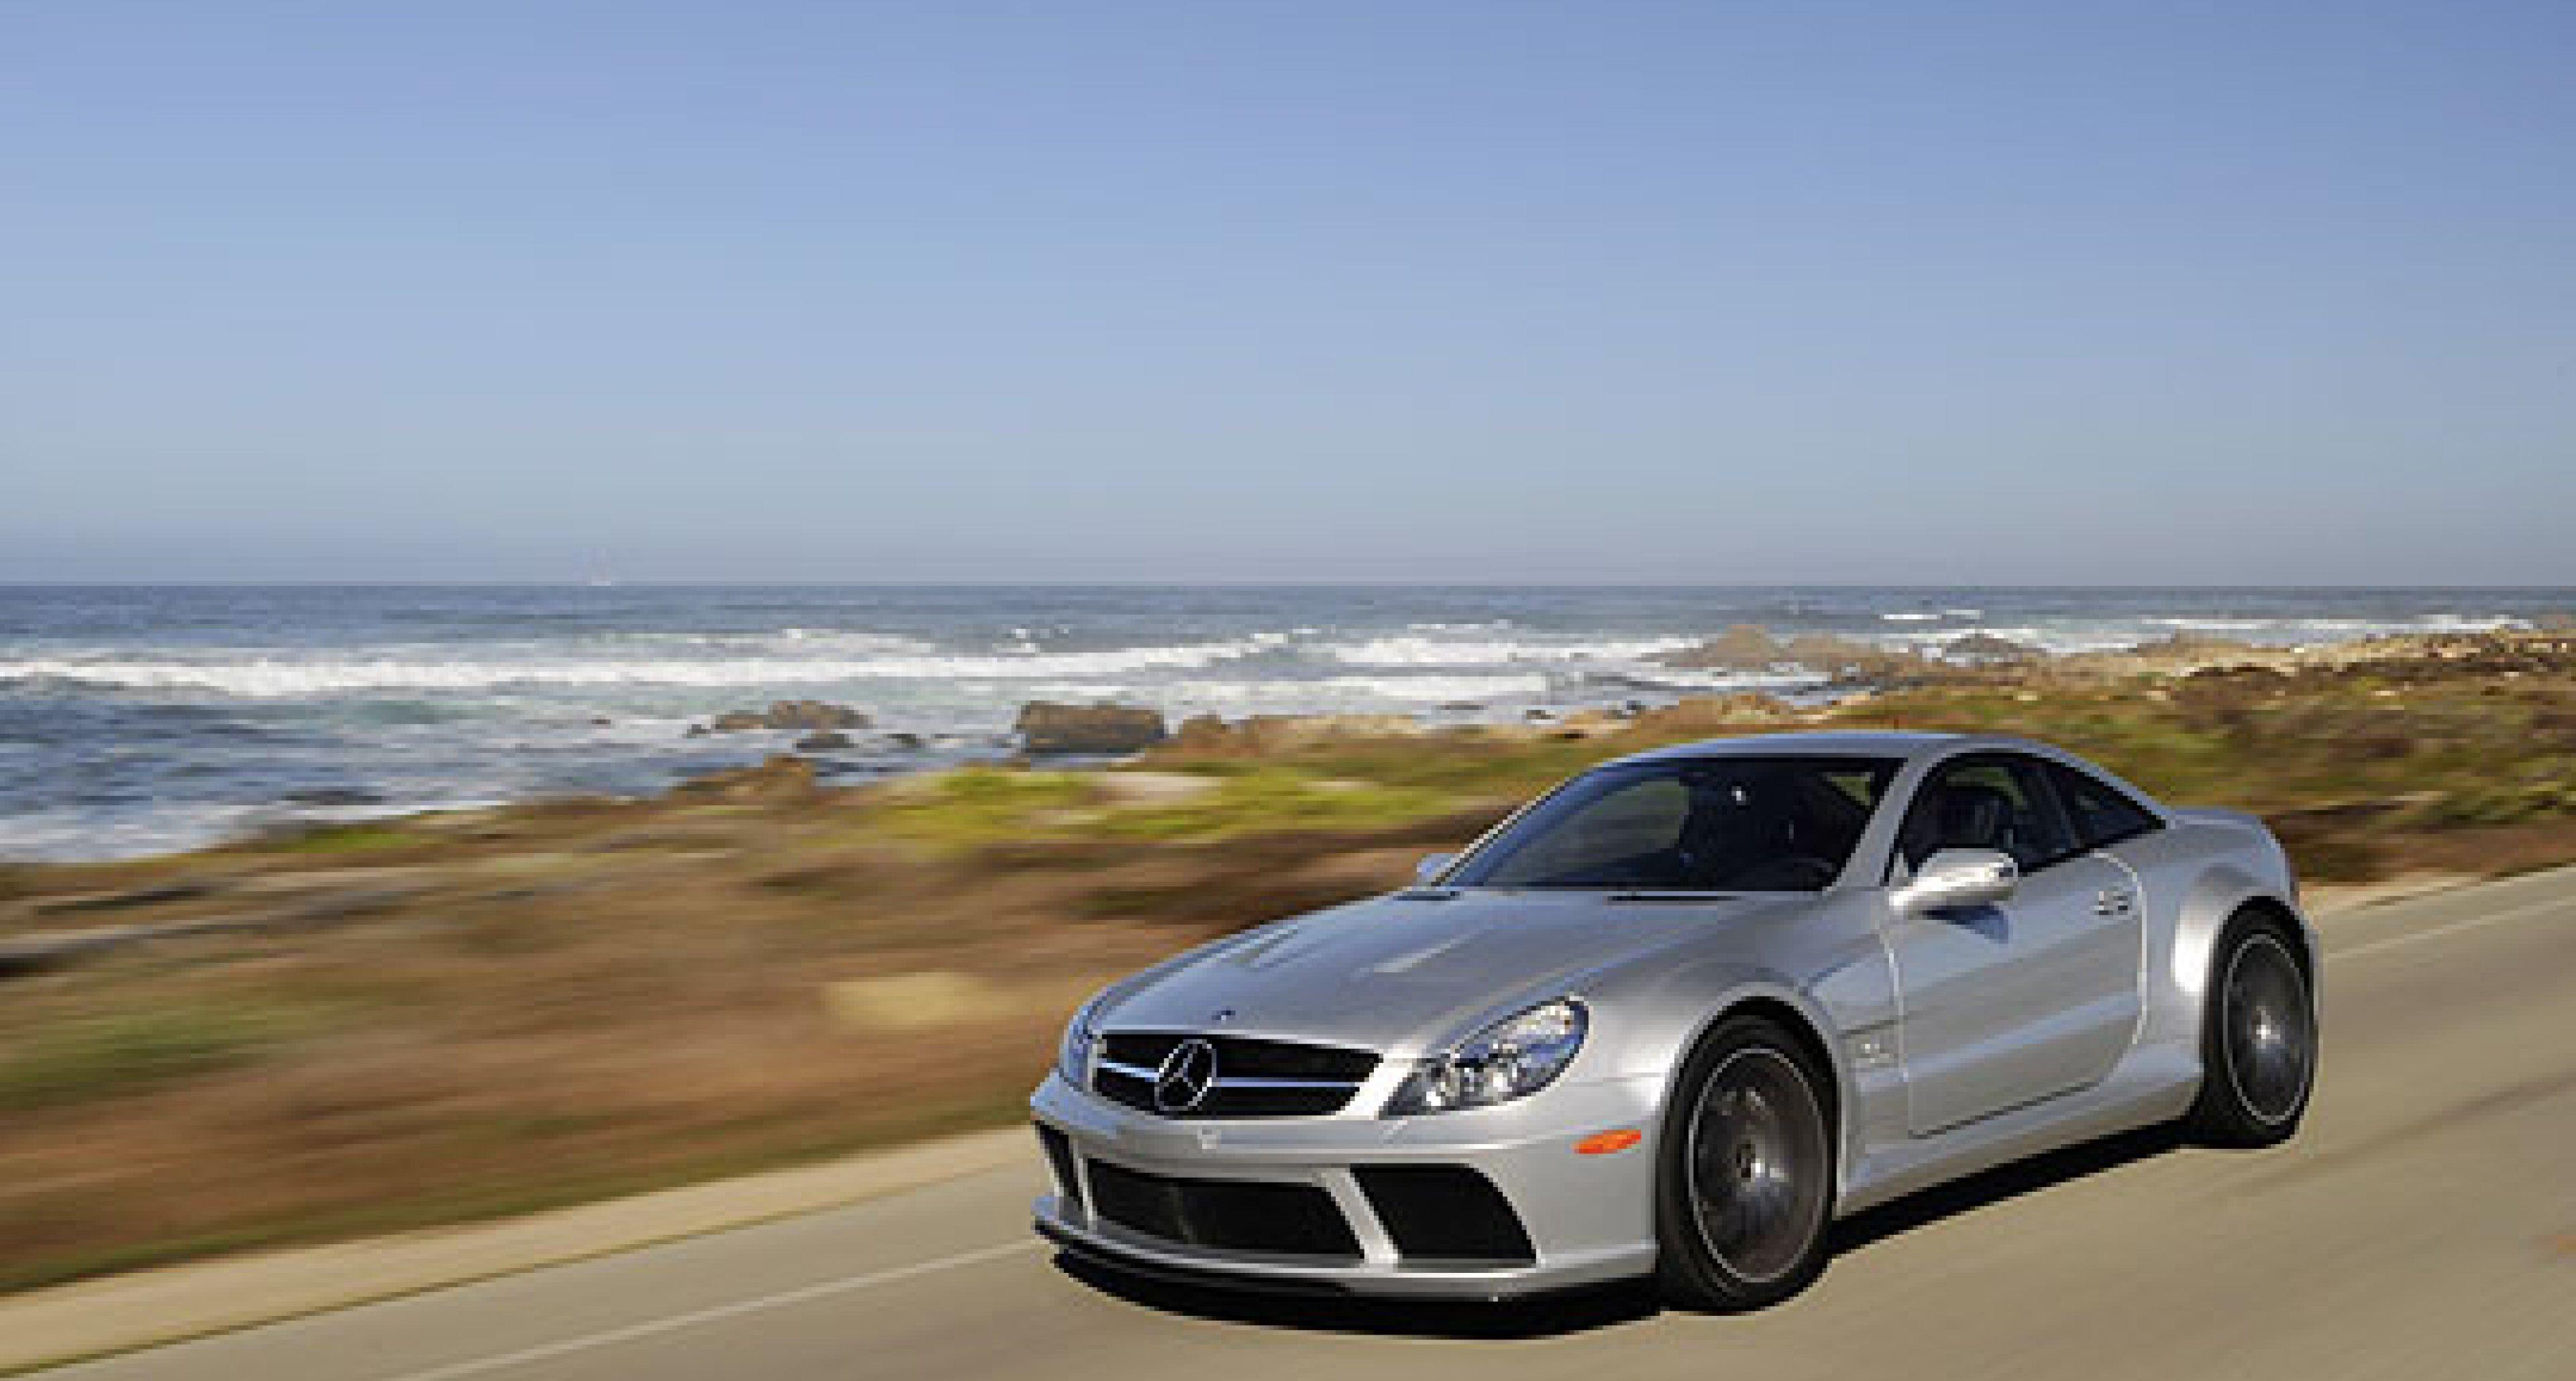 New AMG Performance Models Launched at Laguna Seca